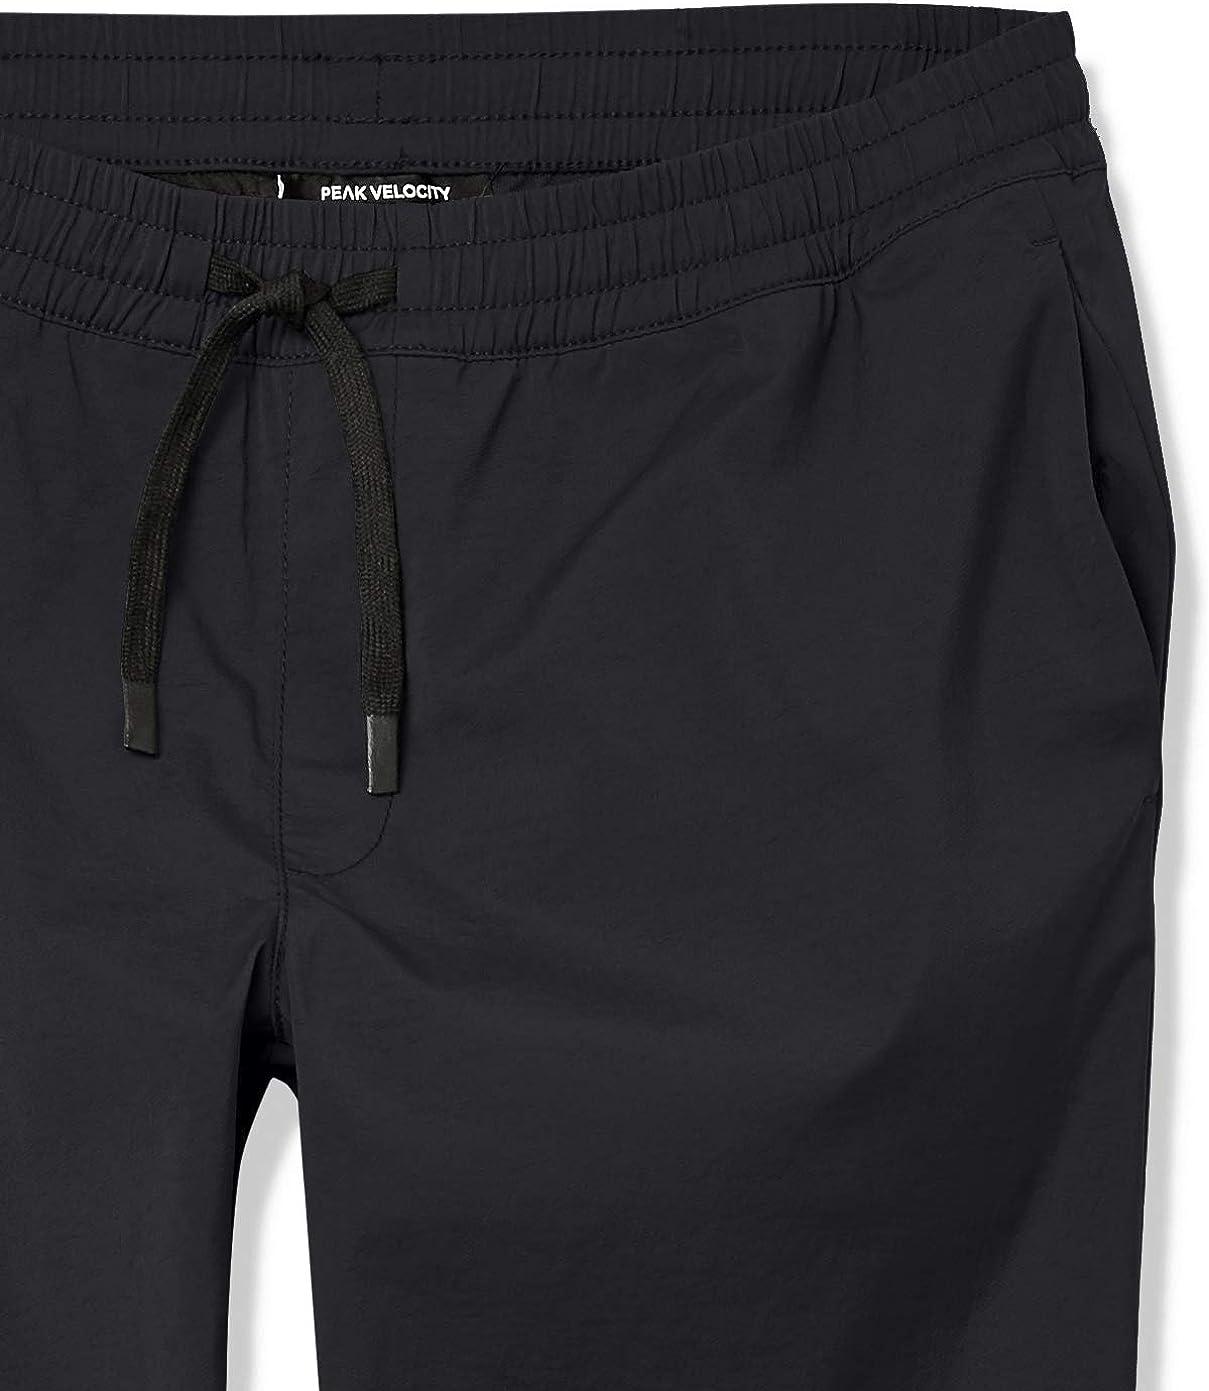 Marchio athletic-pants Uomo Woven All Around Jogger Peak Velocity